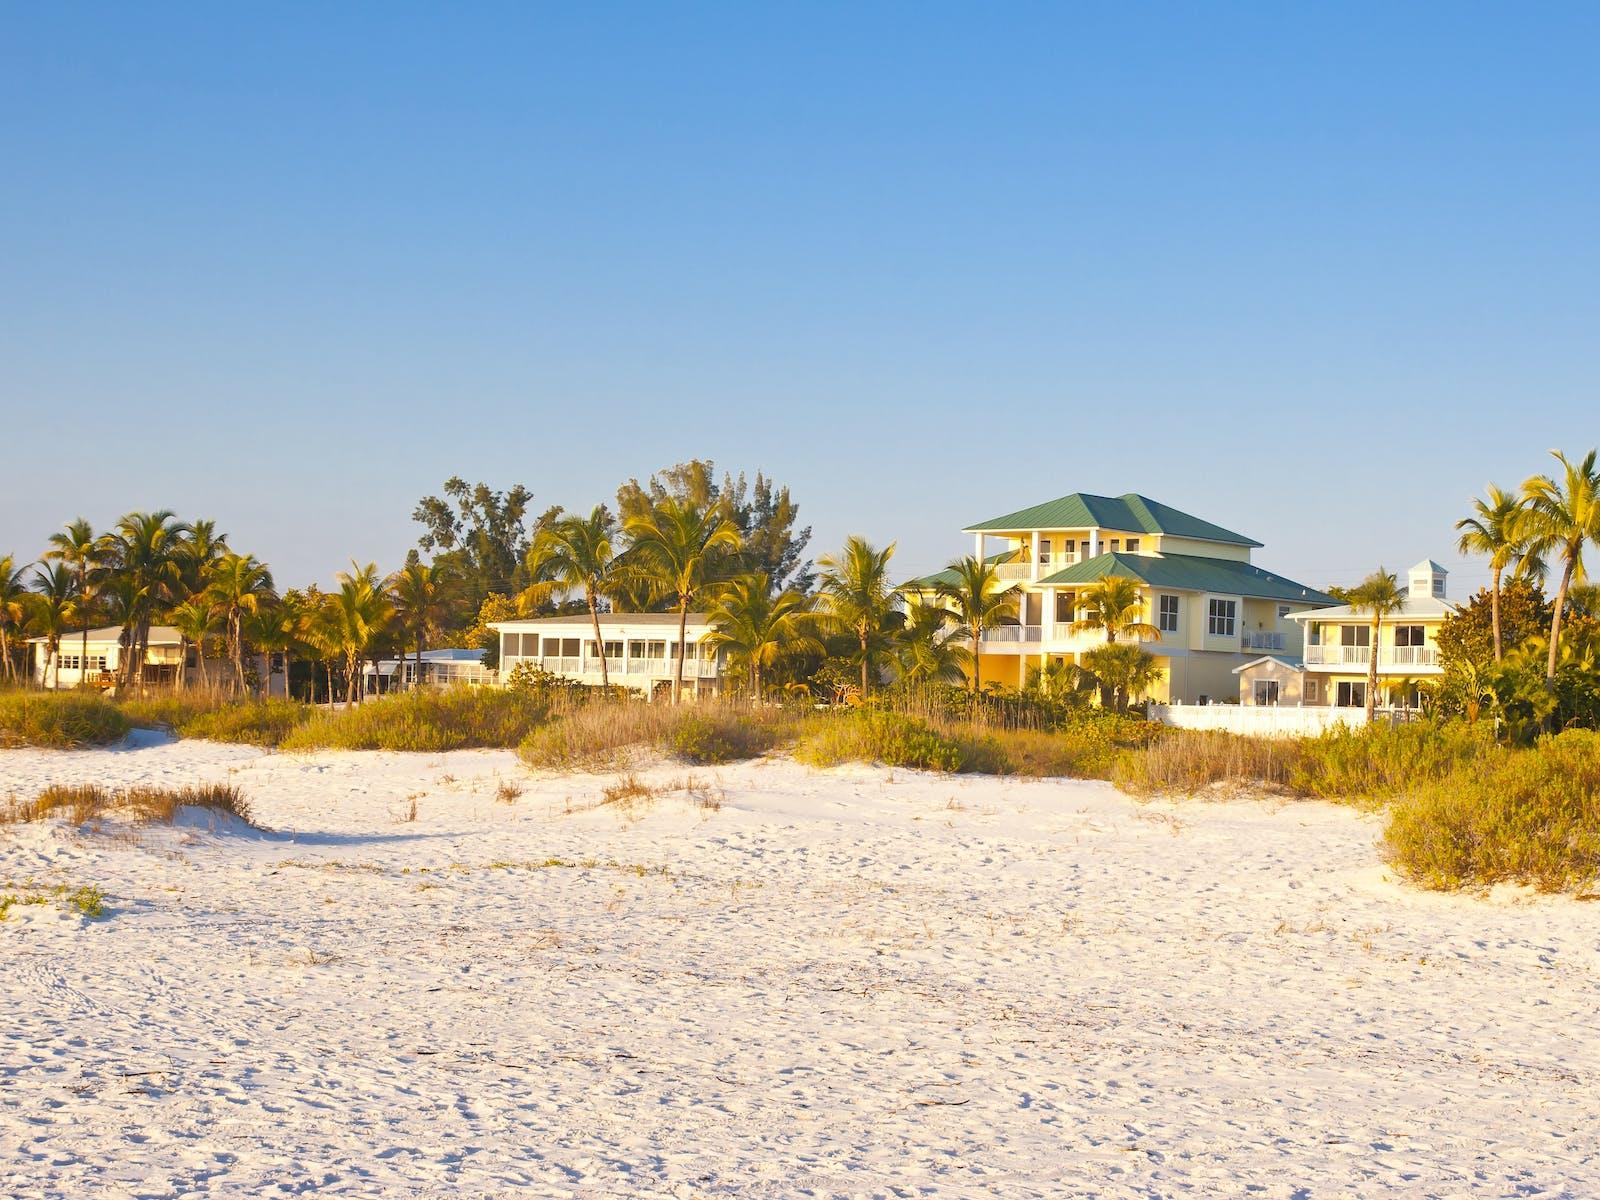 Florida coastline with beachfront vacation rentals